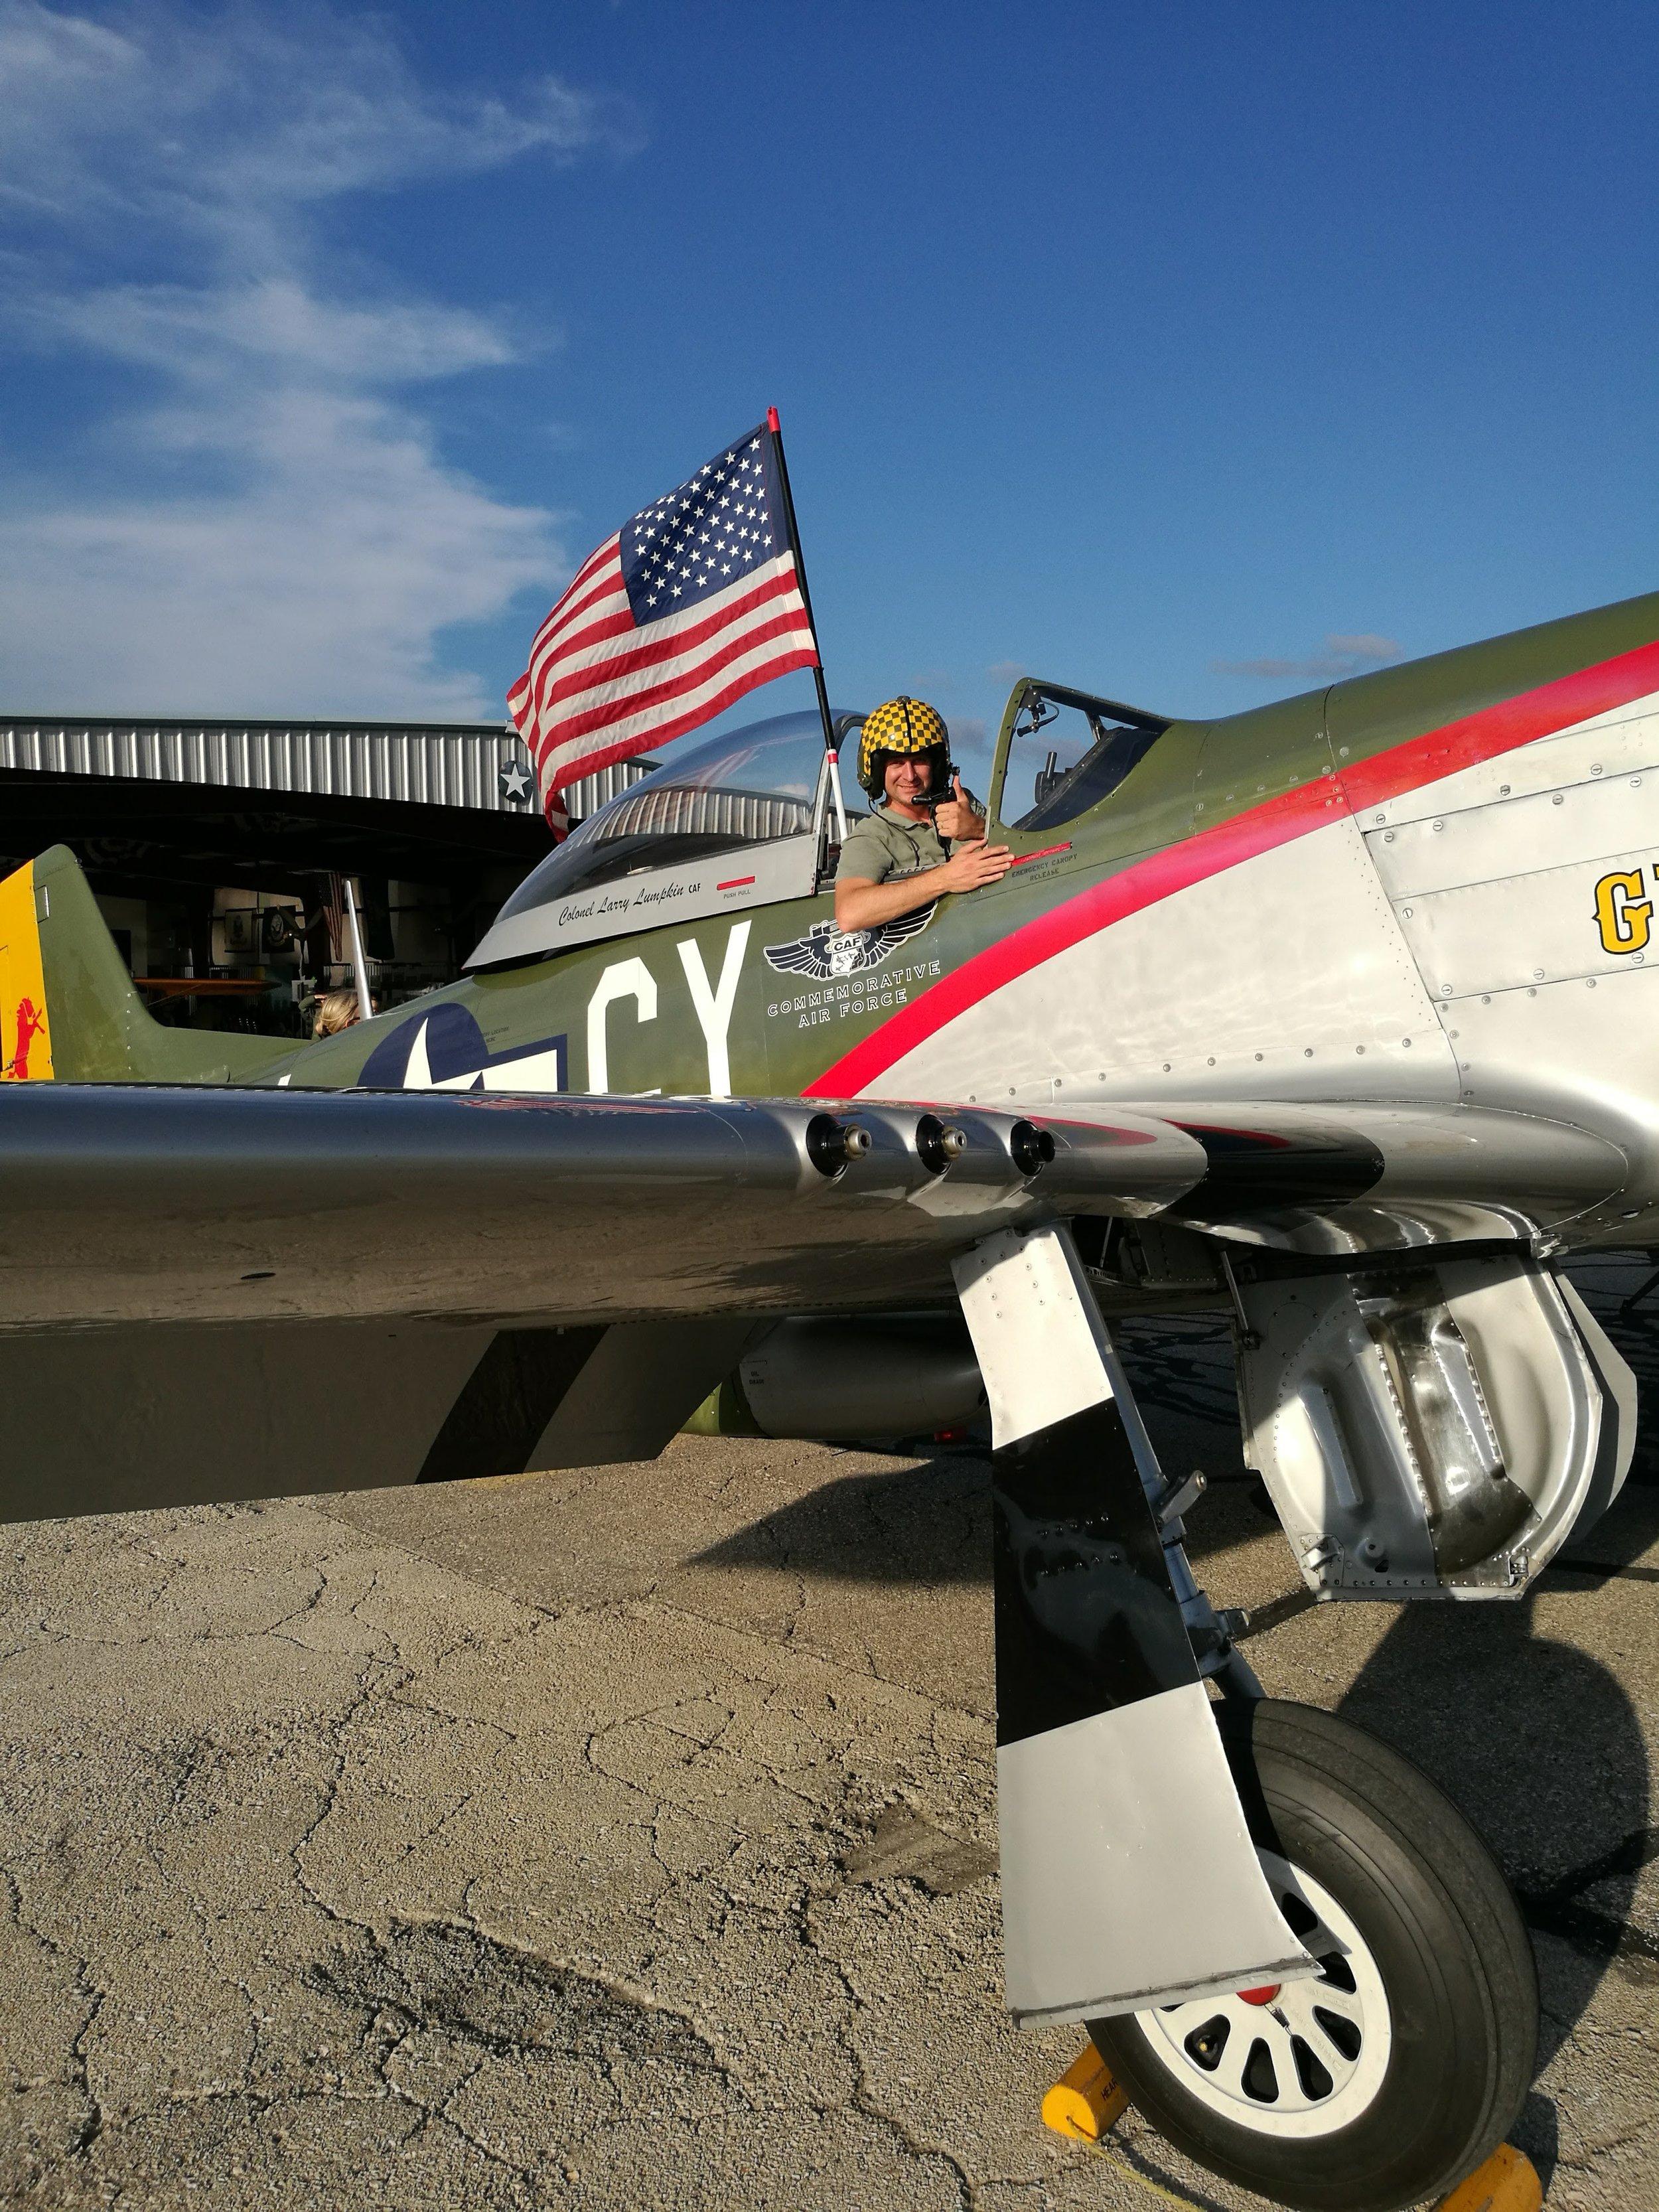 Wouter Blok - P-51 Mustang